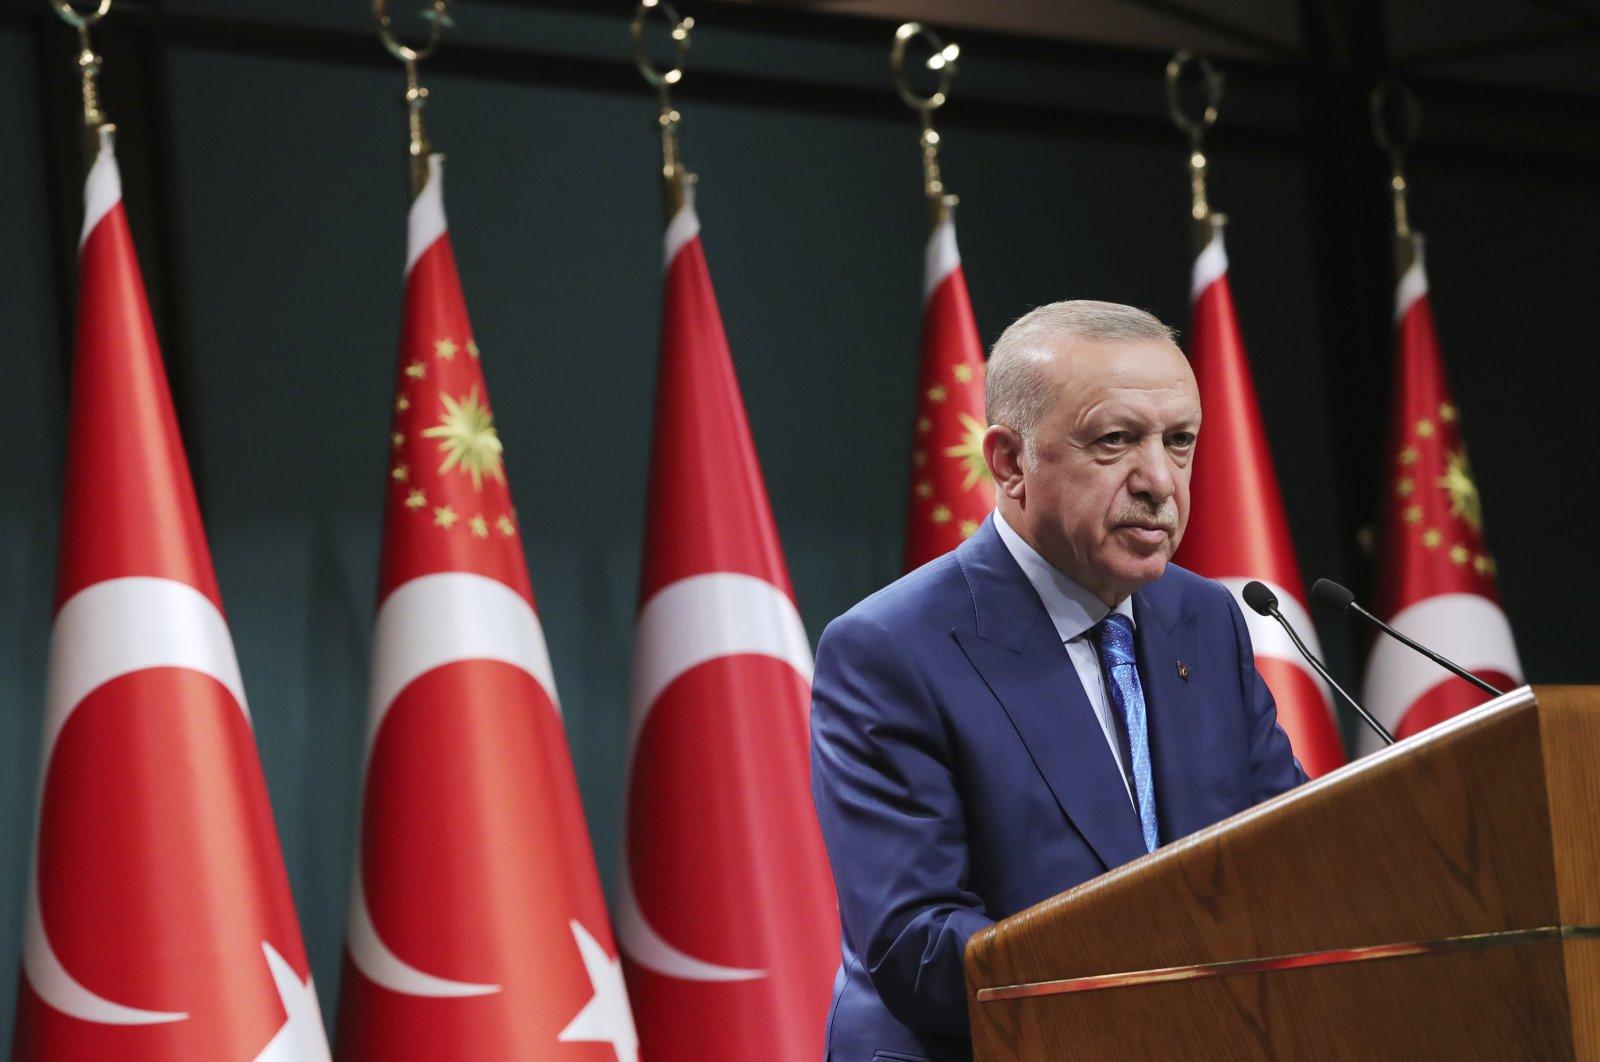 President Recep Tayyip Erdoğan speaks during a televised address following a cabinet meeting, in Ankara, Turkey, Thursday, Aug. 19, 2021. (Turkish Presidency via AP, Pool)